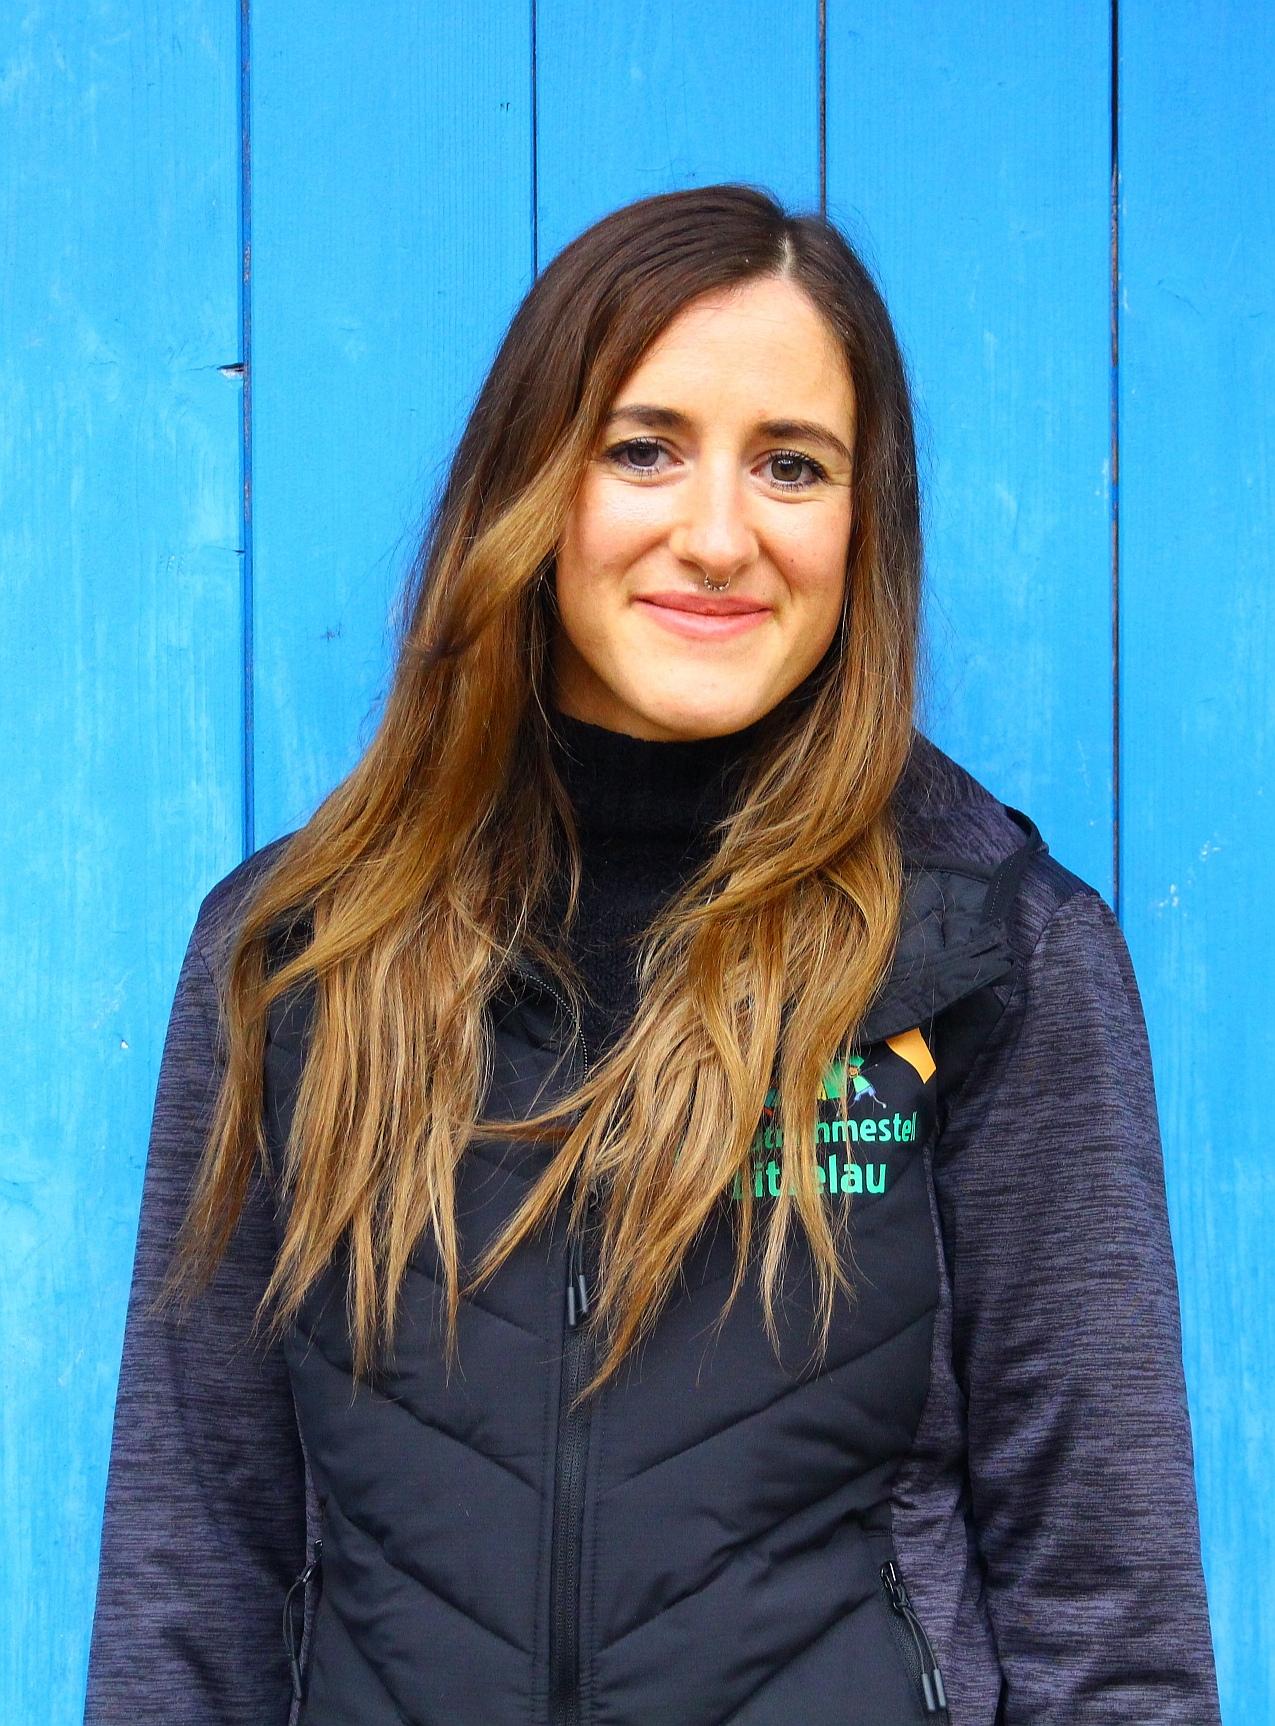 Leonie Schittenhelm